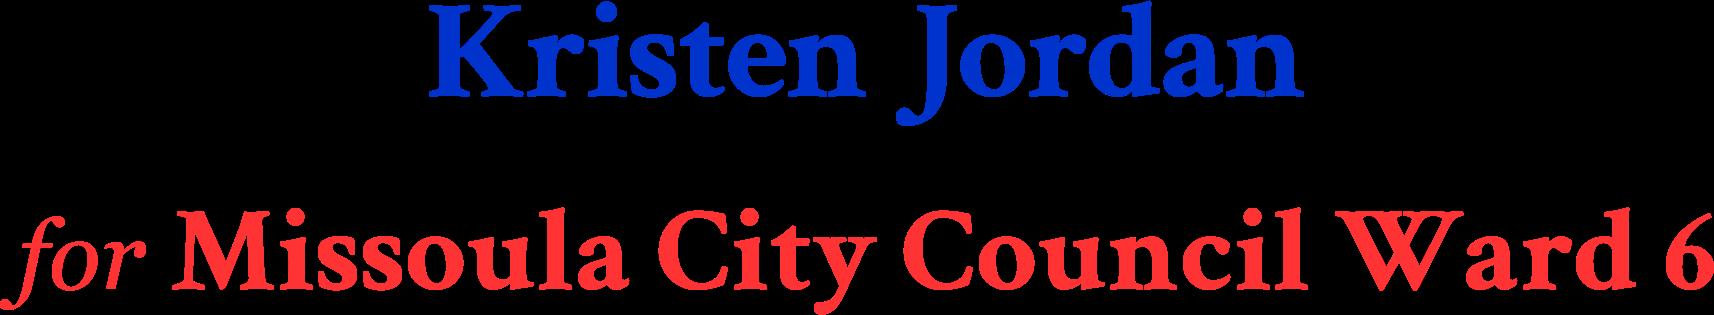 Kristen Jordan Missoula City Council Ward 6